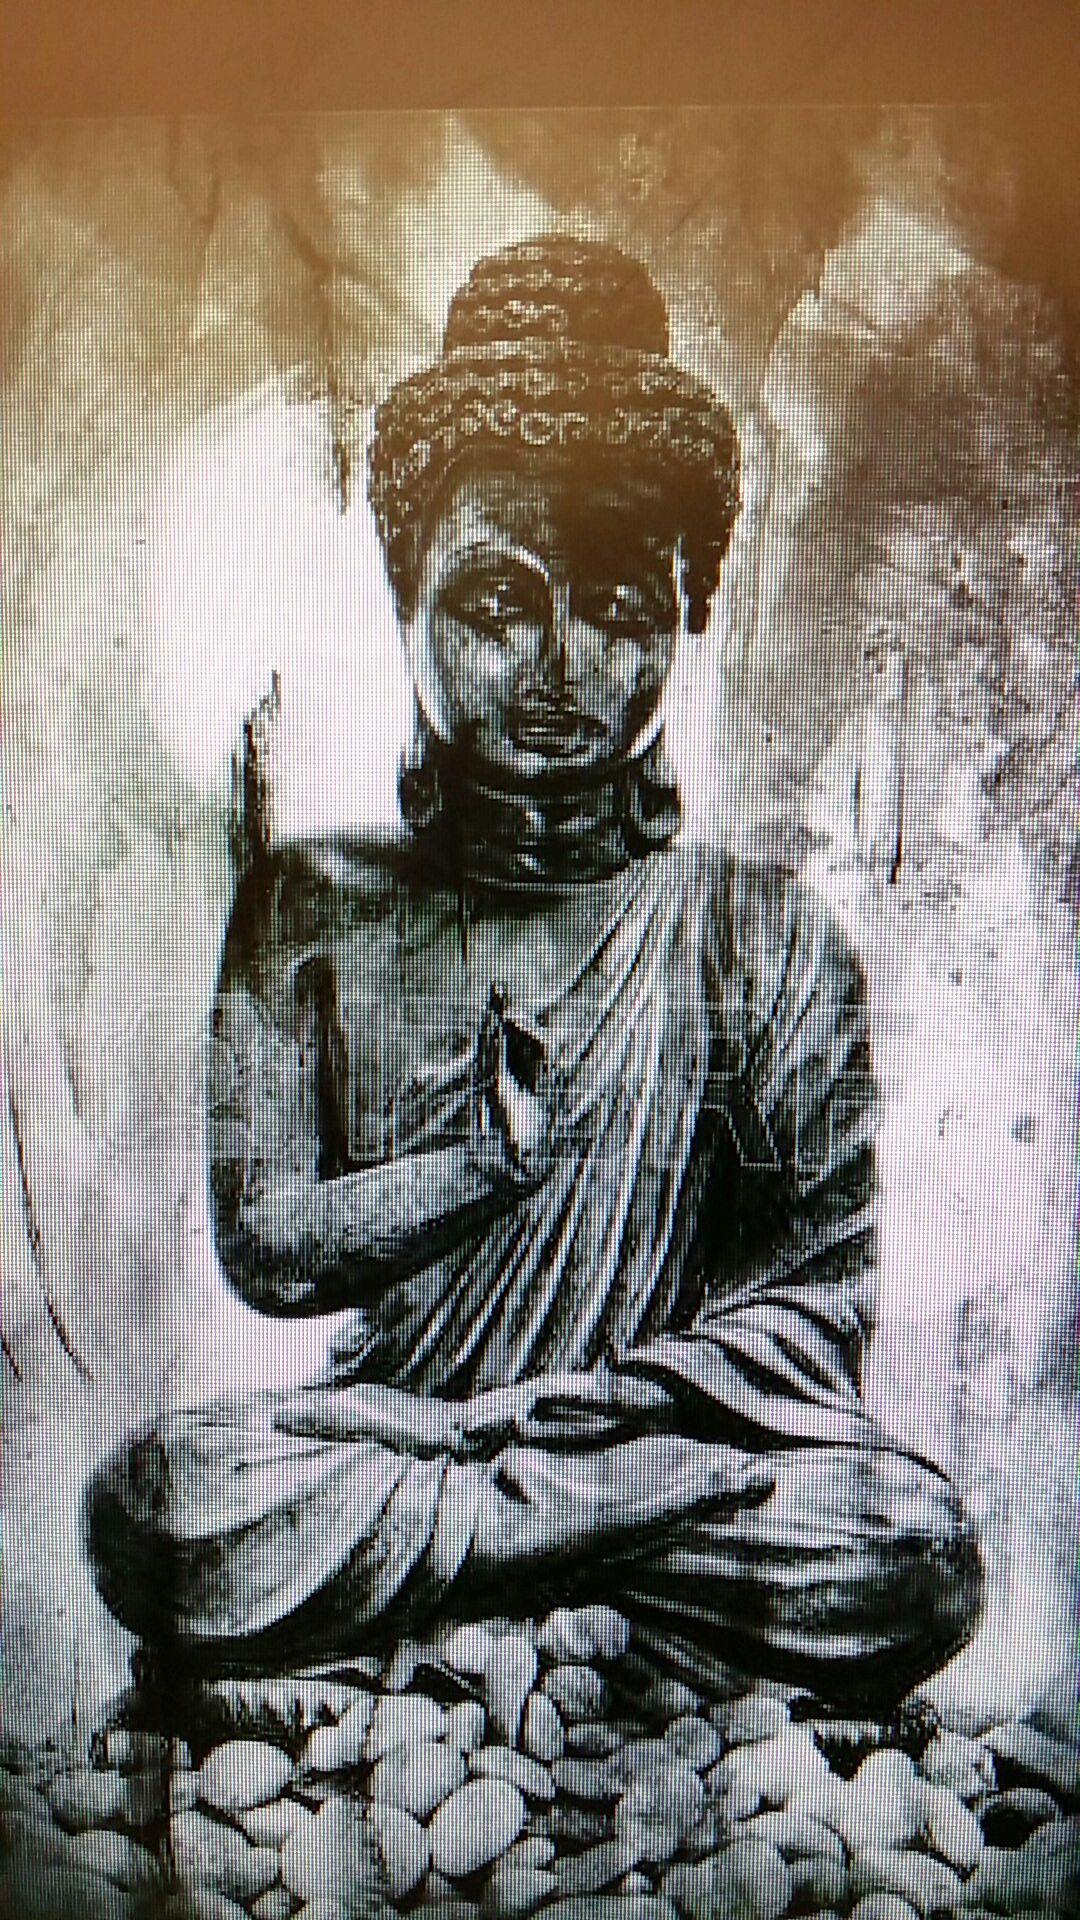 Pin by Chris Choy on Tat | Bushido, Meditation, Astral